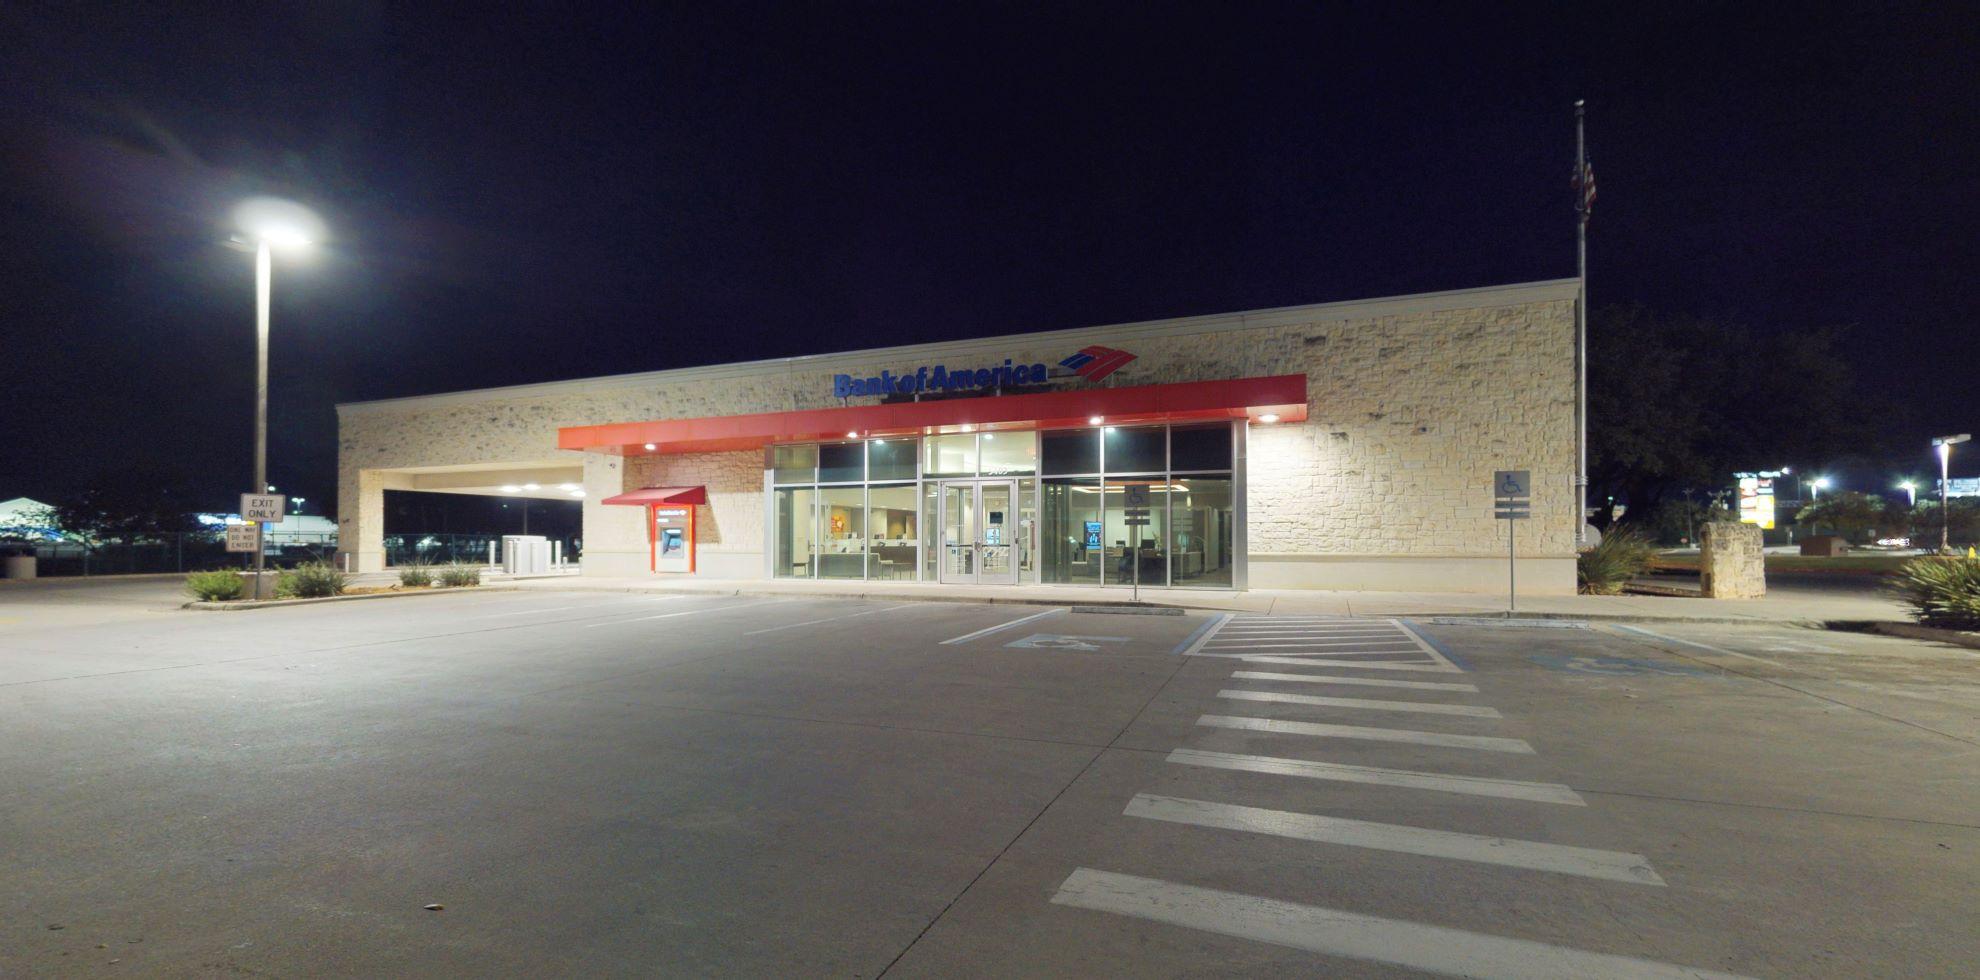 Bank of America financial center with drive-thru ATM and teller   5403 De Zavala Rd, San Antonio, TX 78249